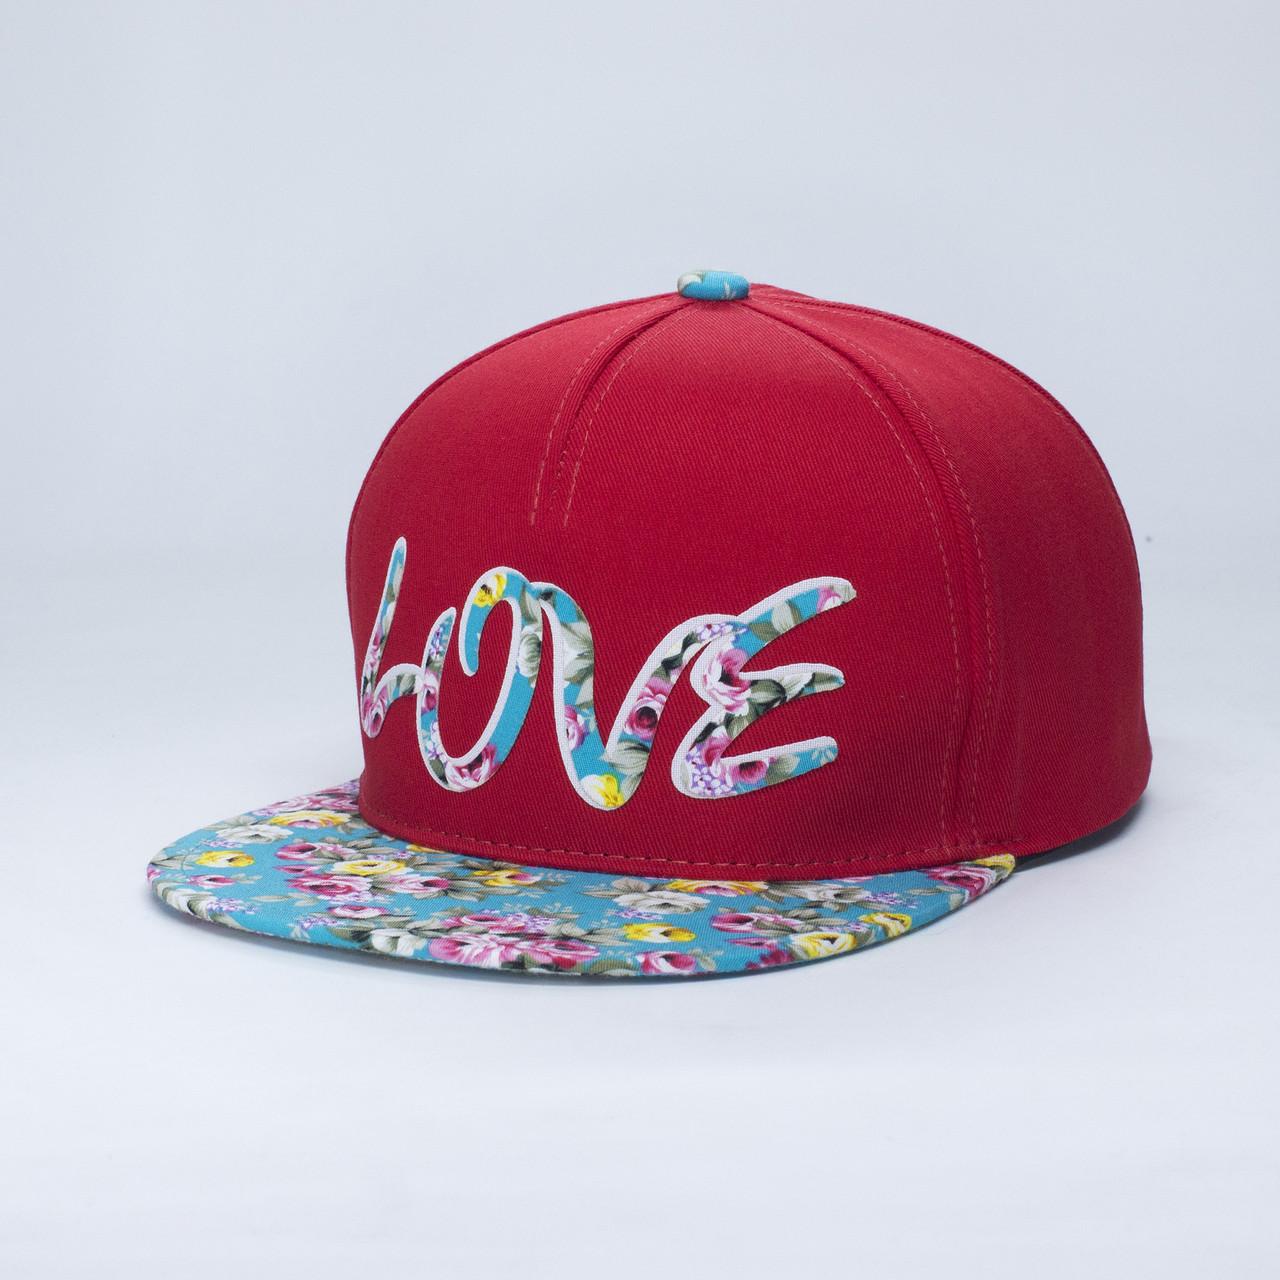 Кепка бейсболка INAL LOVE M / 55-56 RU Красный 47955